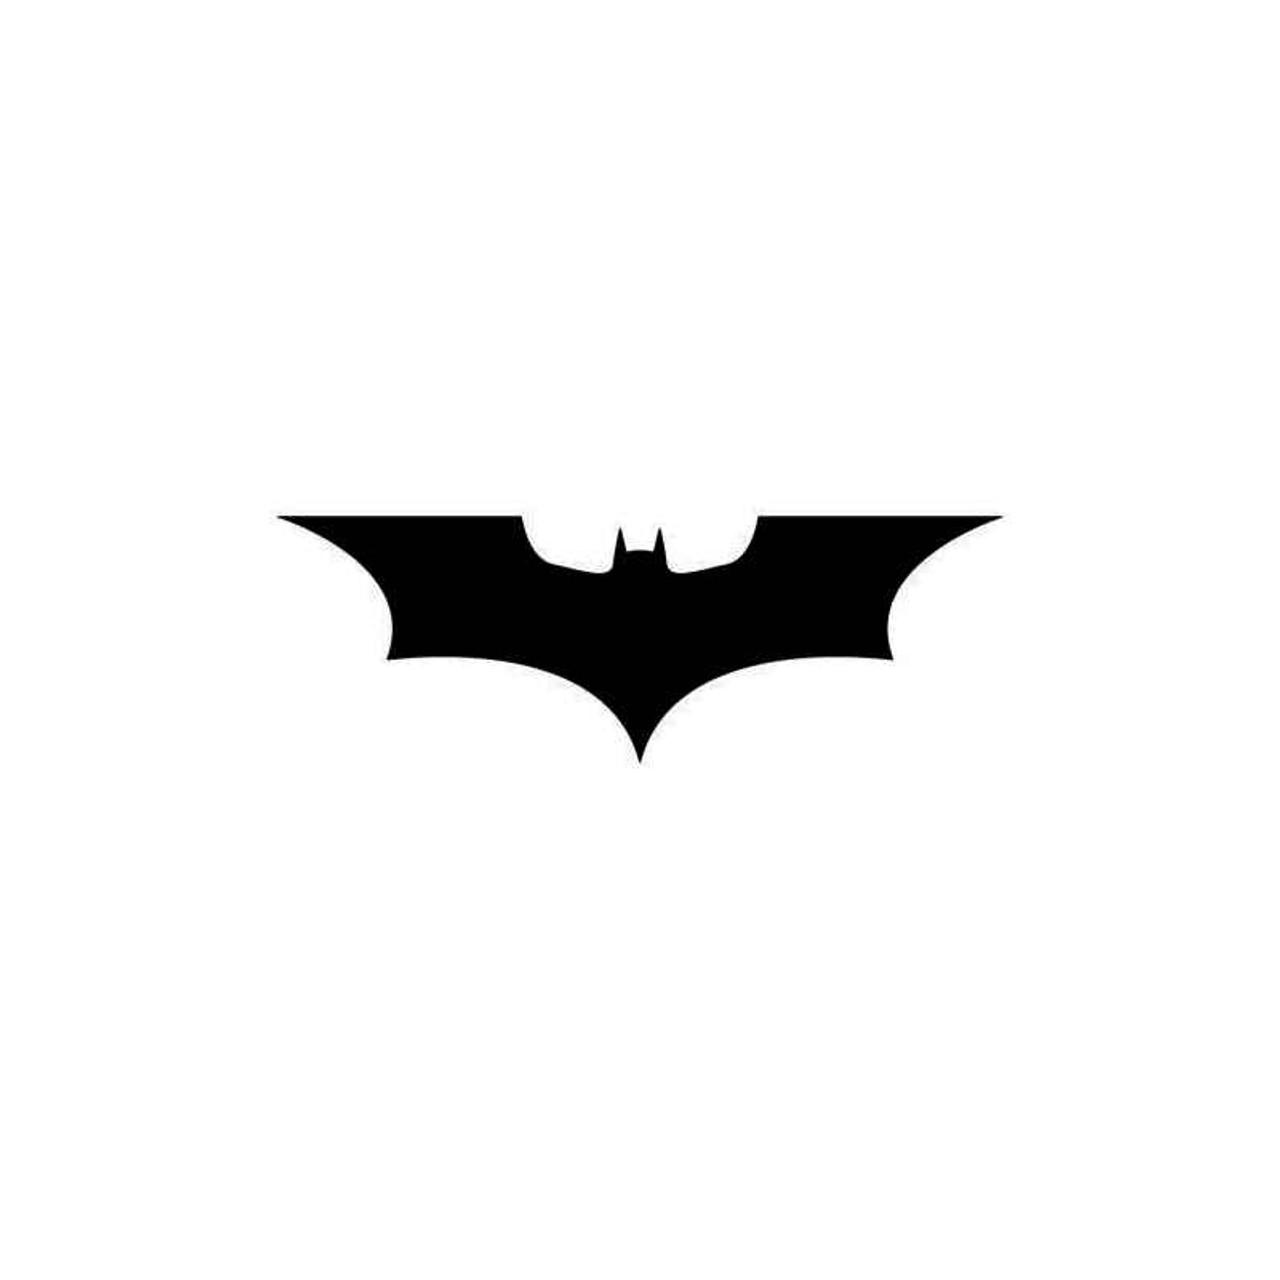 Batman symbol dark knight. Dc comics logo decal